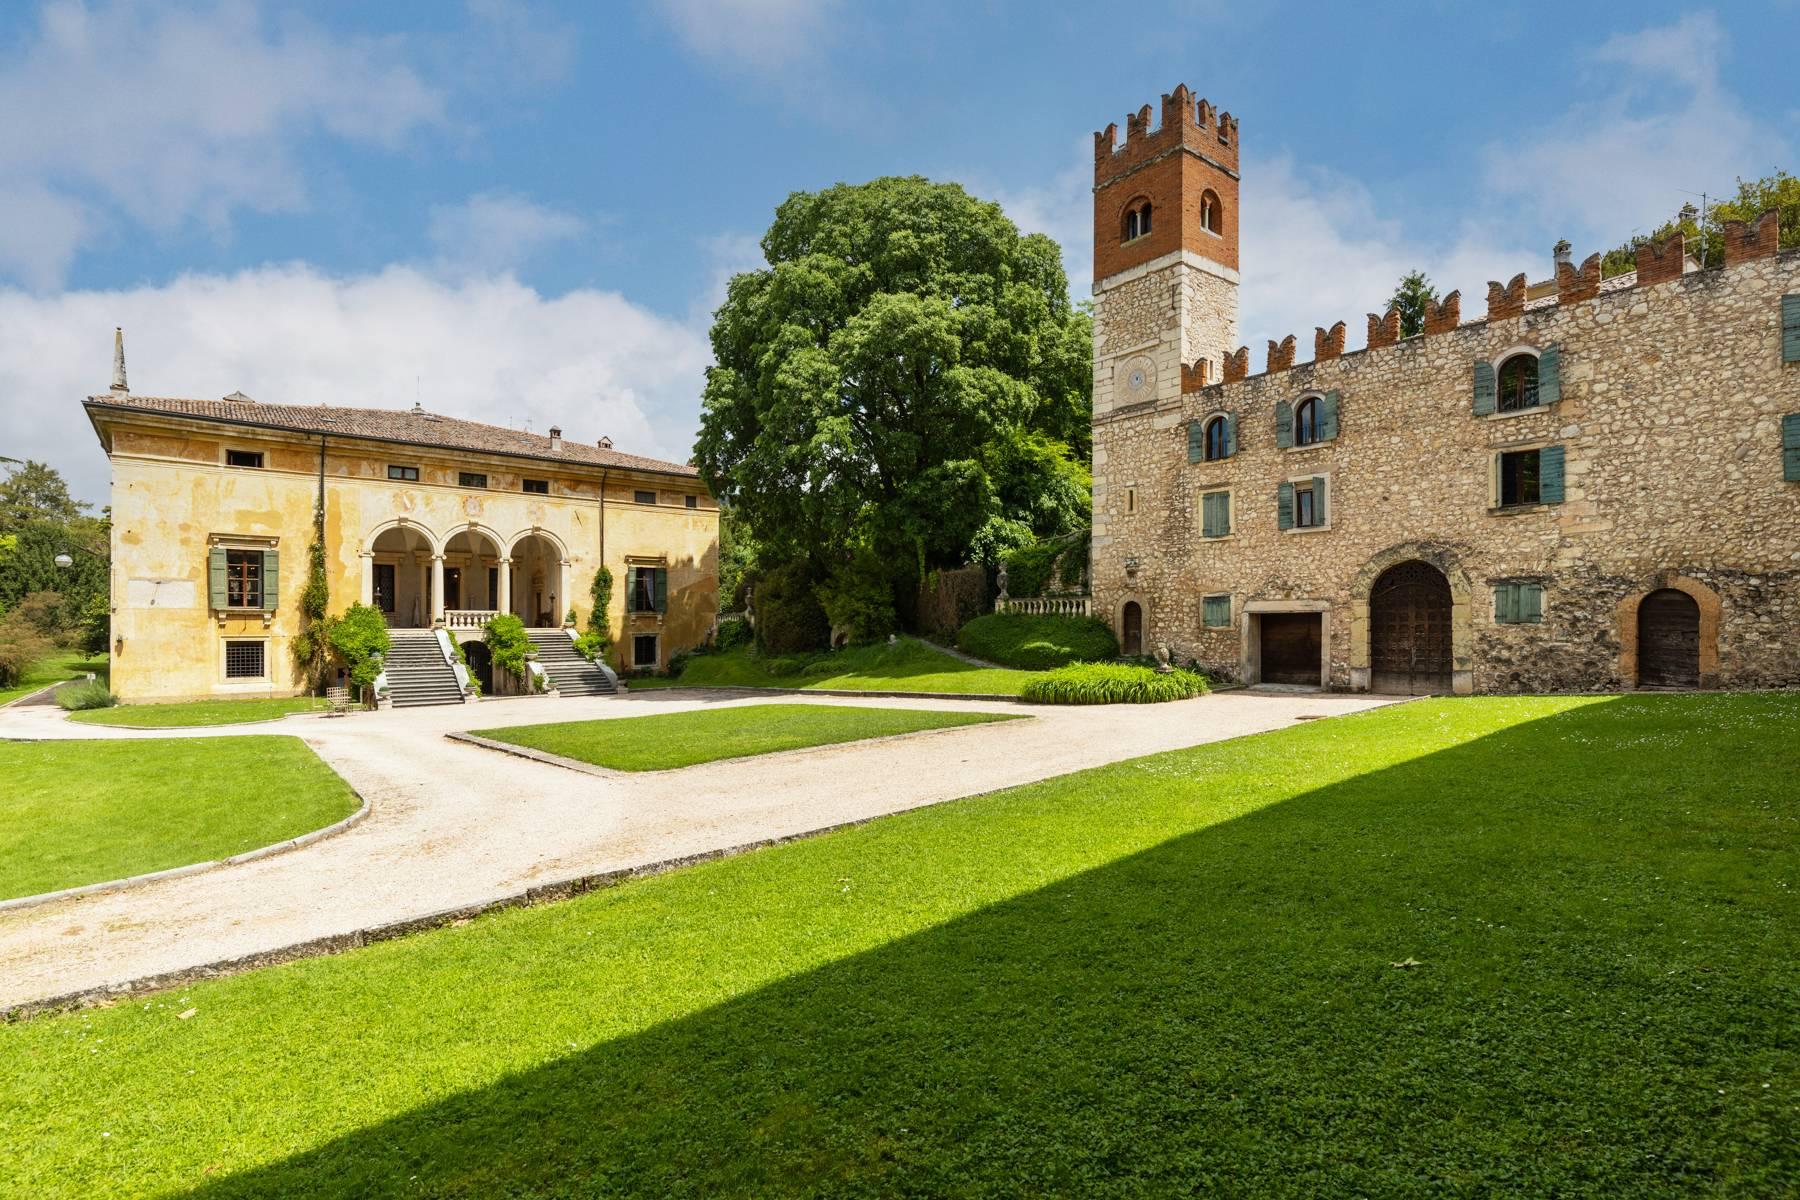 Villa in Vendita a Verona: 5 locali, 2400 mq - Foto 6